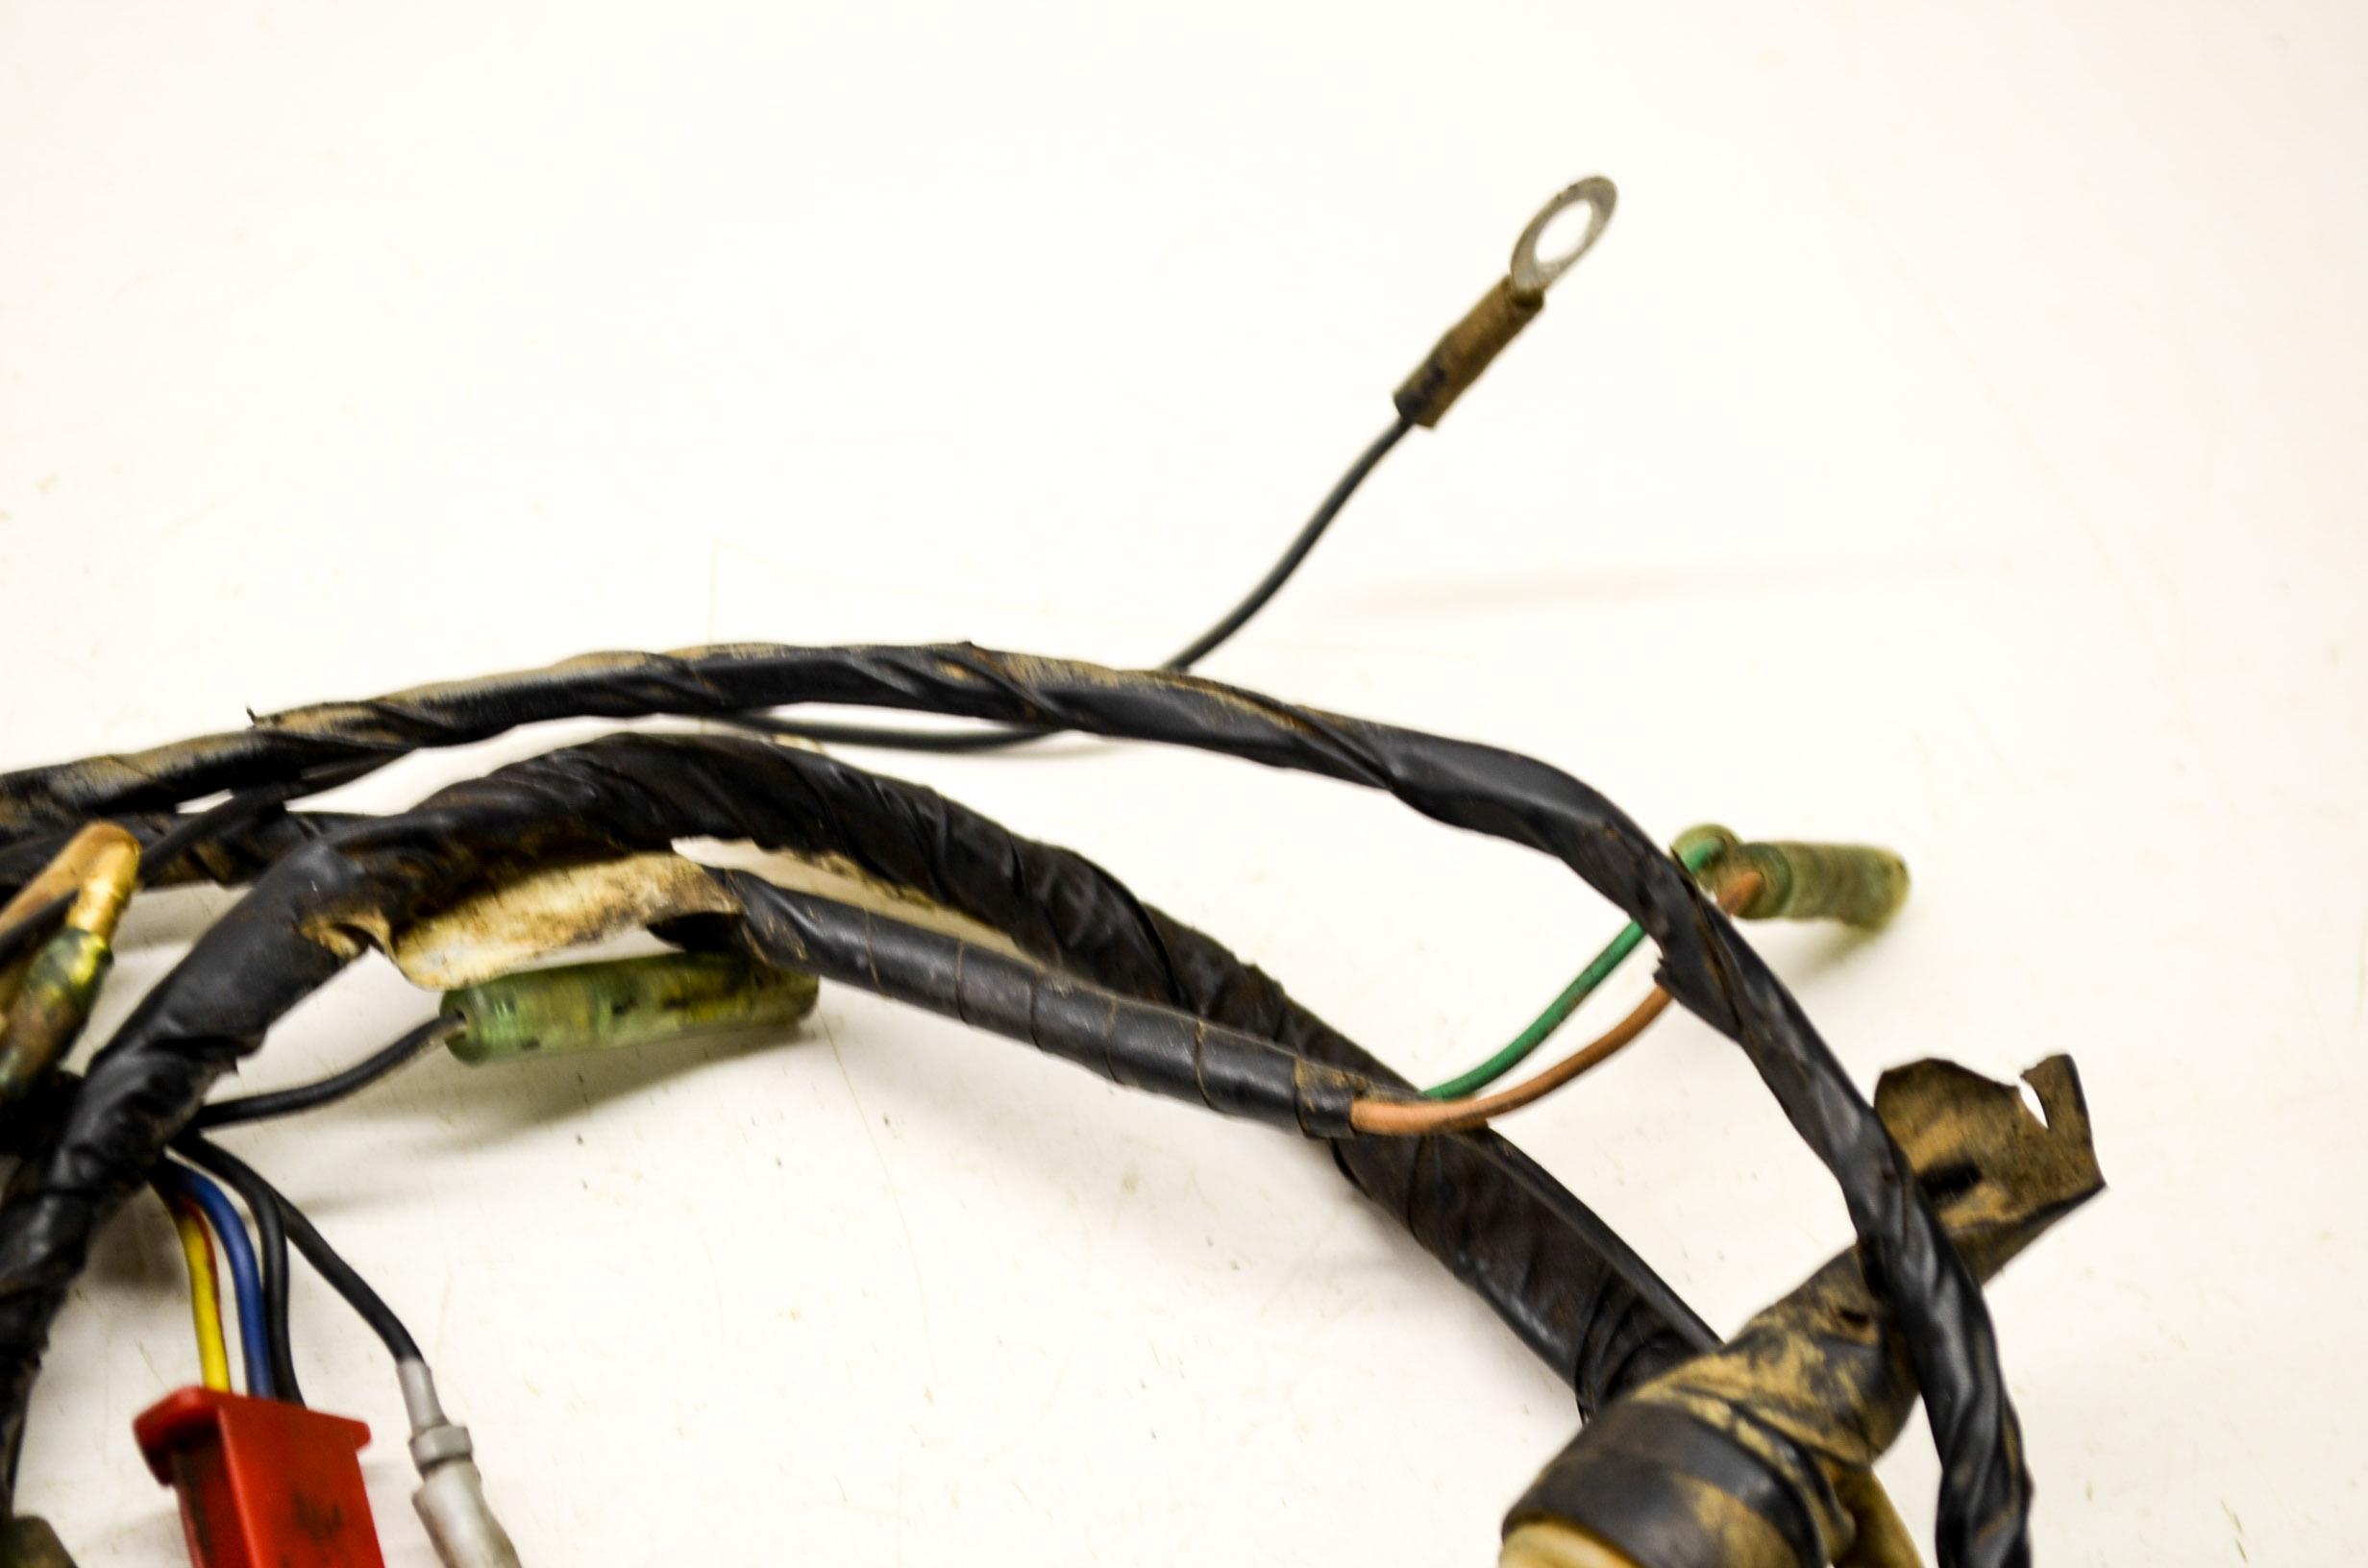 1683-5 Yamaha Blaster Wire Diagram Electric on suzuki wire diagram, banshee wire diagram, yamaha breeze wire diagram, yamaha blaster fuse, yamaha blaster parts, kawasaki wire diagram, yfz 450 wire diagram, yamaha blaster white, yamaha bolt wire diagram, 300ex wire diagram, harley davidson wire diagram, 400ex wire diagram, wiring harness diagram, yamaha blaster motor, raptor 660 wire diagram, warrior wire diagram, yamaha snowmobile wiring diagrams, yamaha blaster head, yamaha banshee wiring-diagram, yamaha atv wiring diagram,